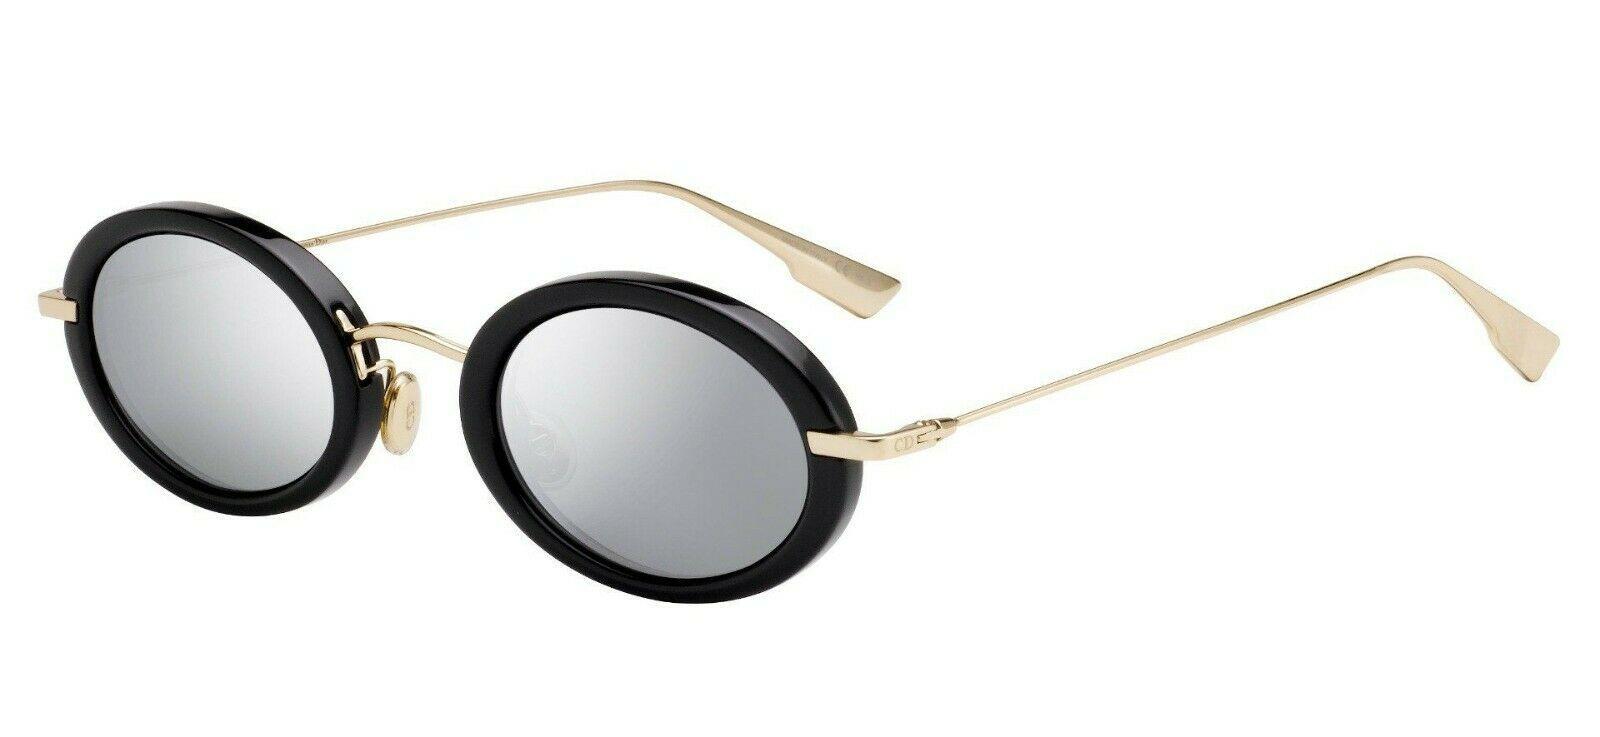 Christian Dior HYPNOTIC 2 Black/Silver Mirrored (2M2/0T) Sunglasses AUTHENTIC - $219.73